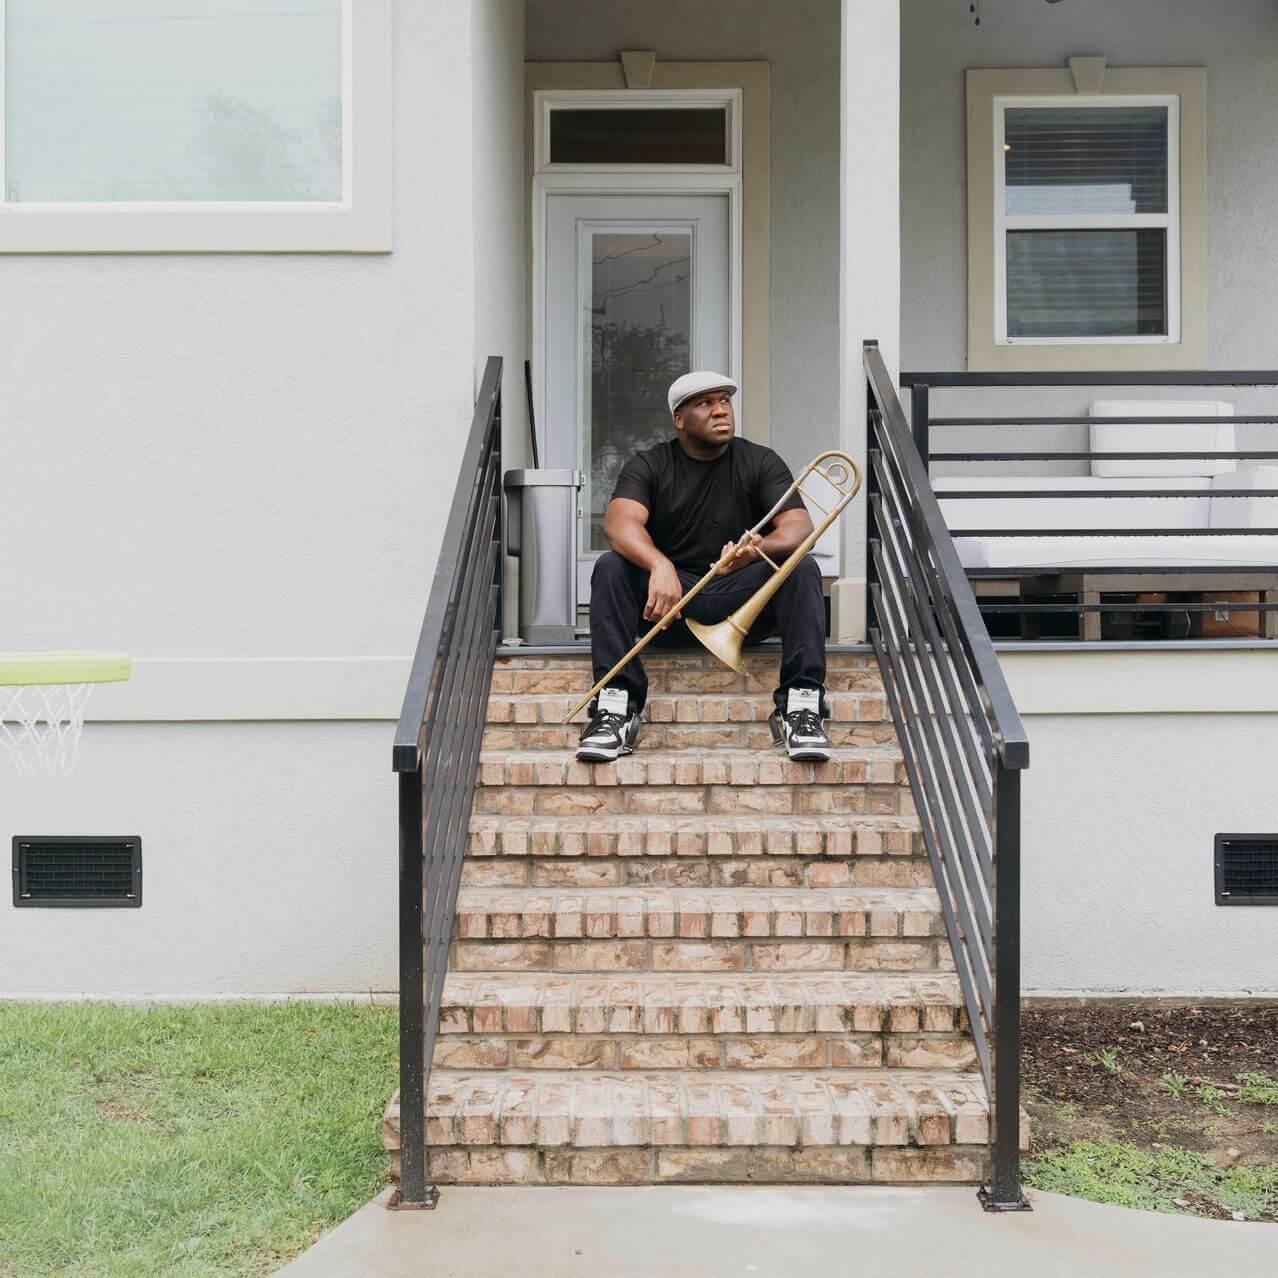 Coronavirus Devastates Black New Orleans: 'This Is Bigger Than Katrina'